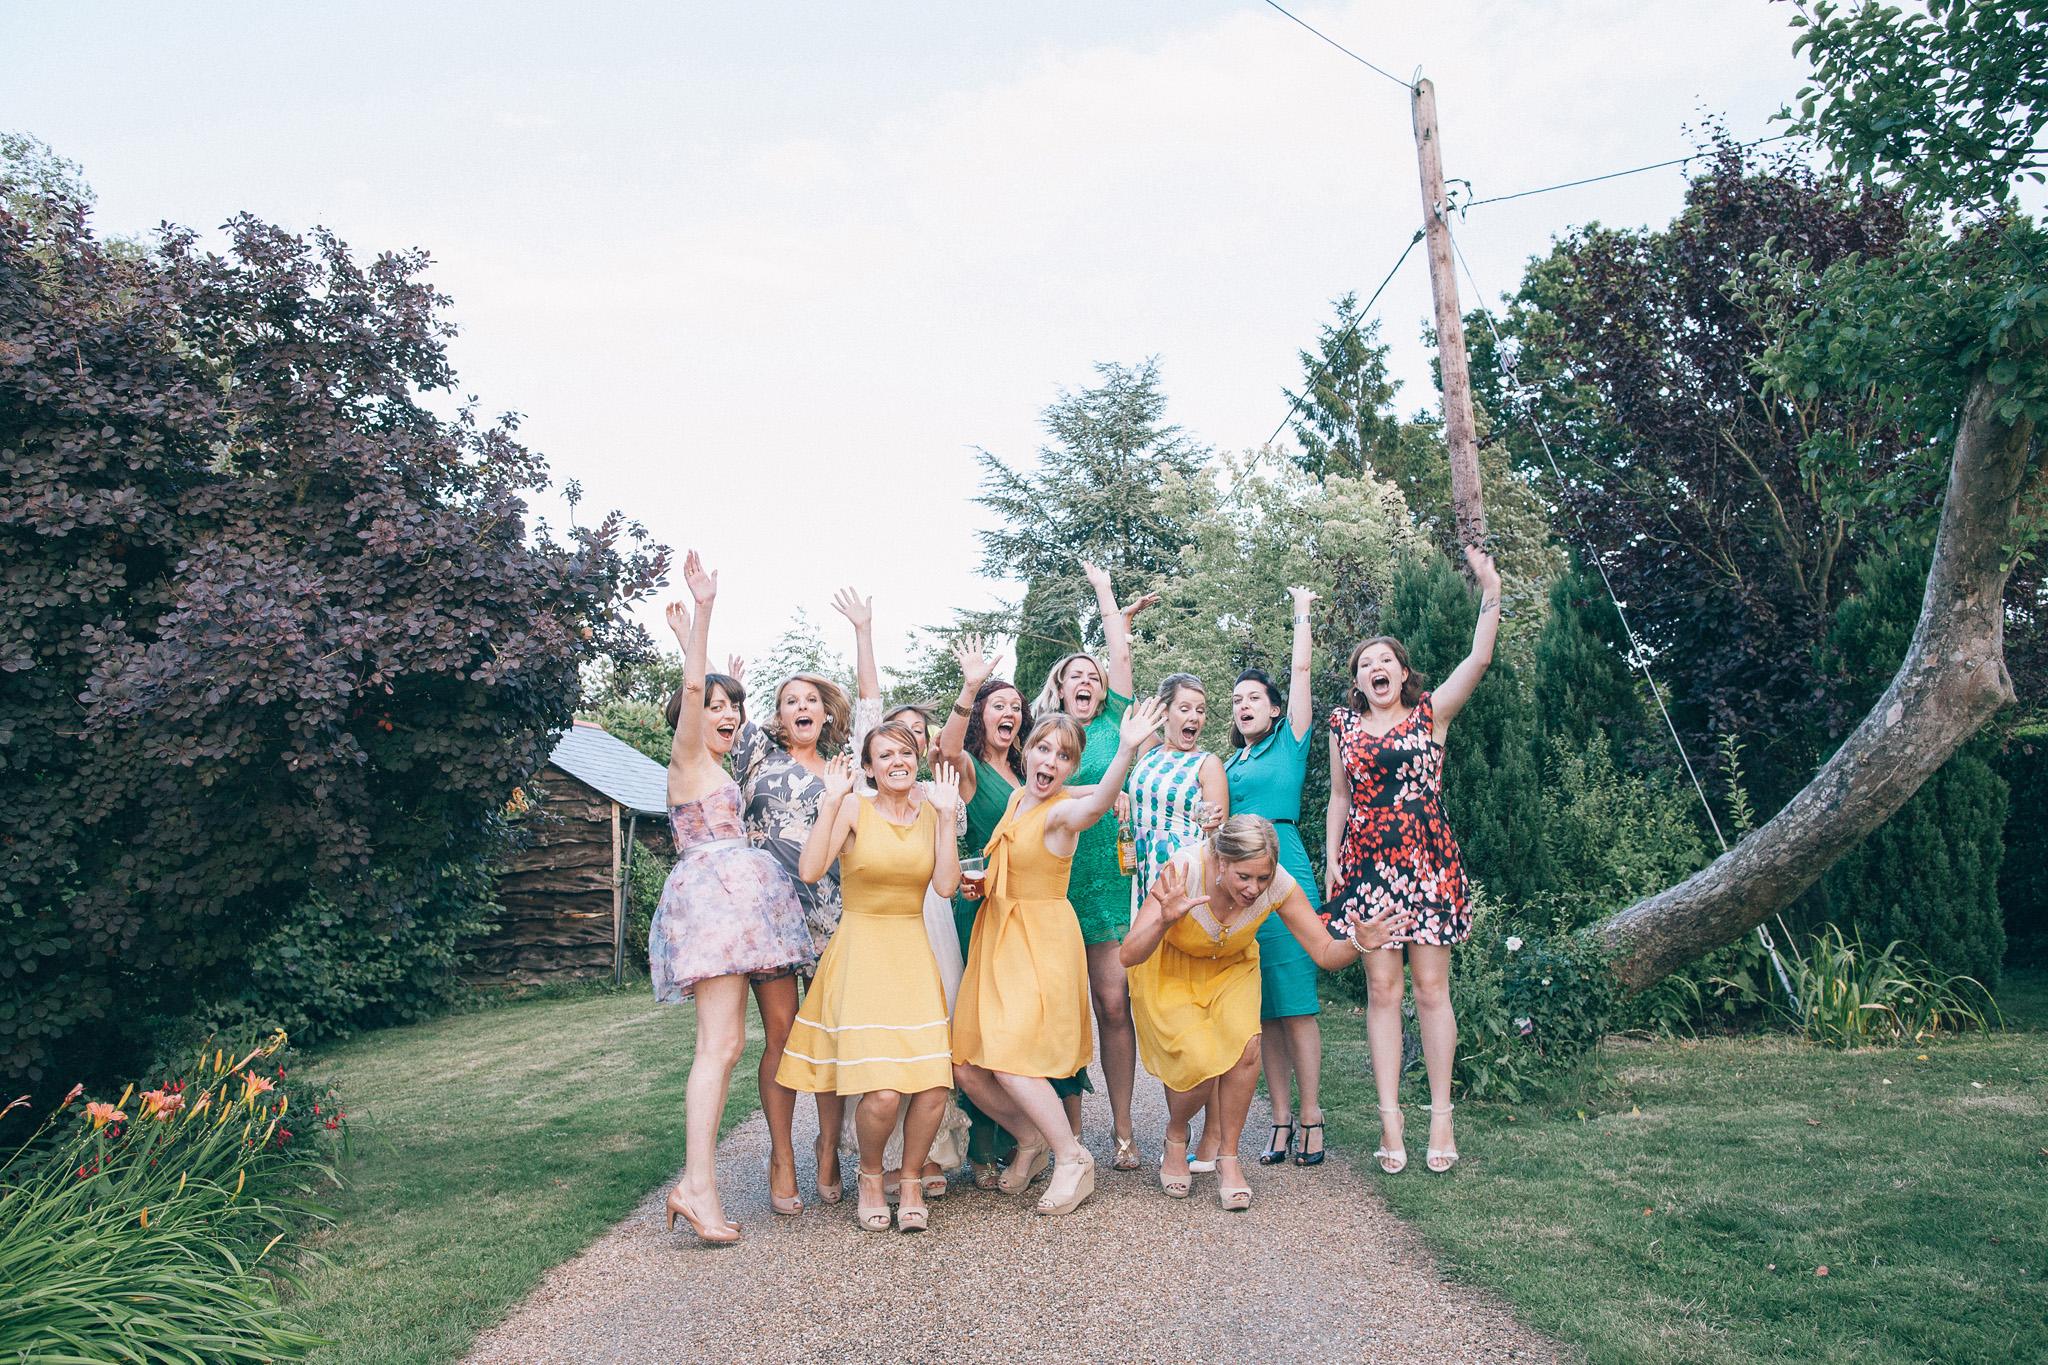 chantry_sussex_barn_wedding_352.jpg